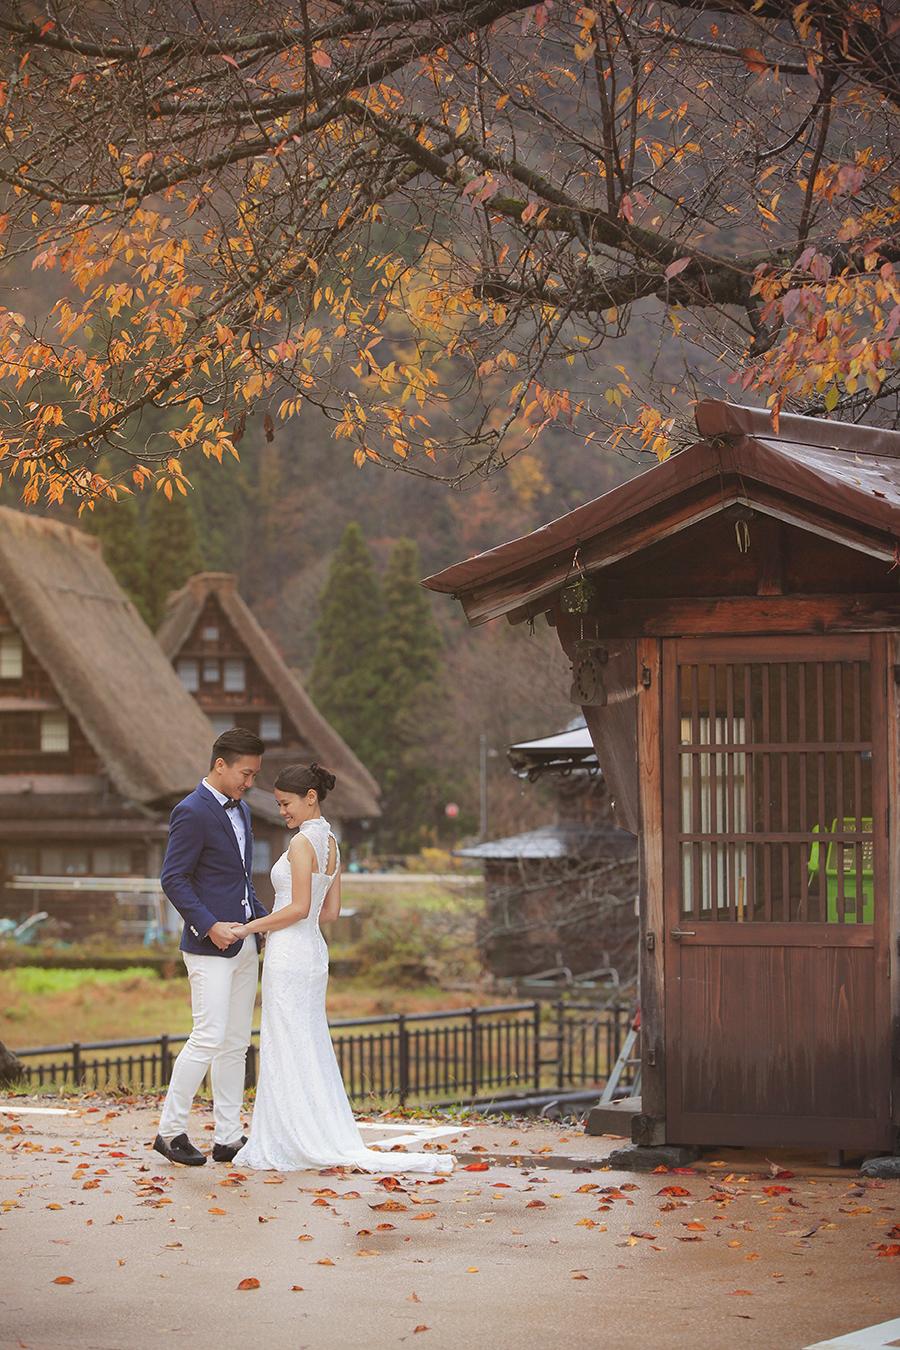 shirakawago japan . pre-wedding photography by kurt ahs . terry+zoey . 4254.jpg